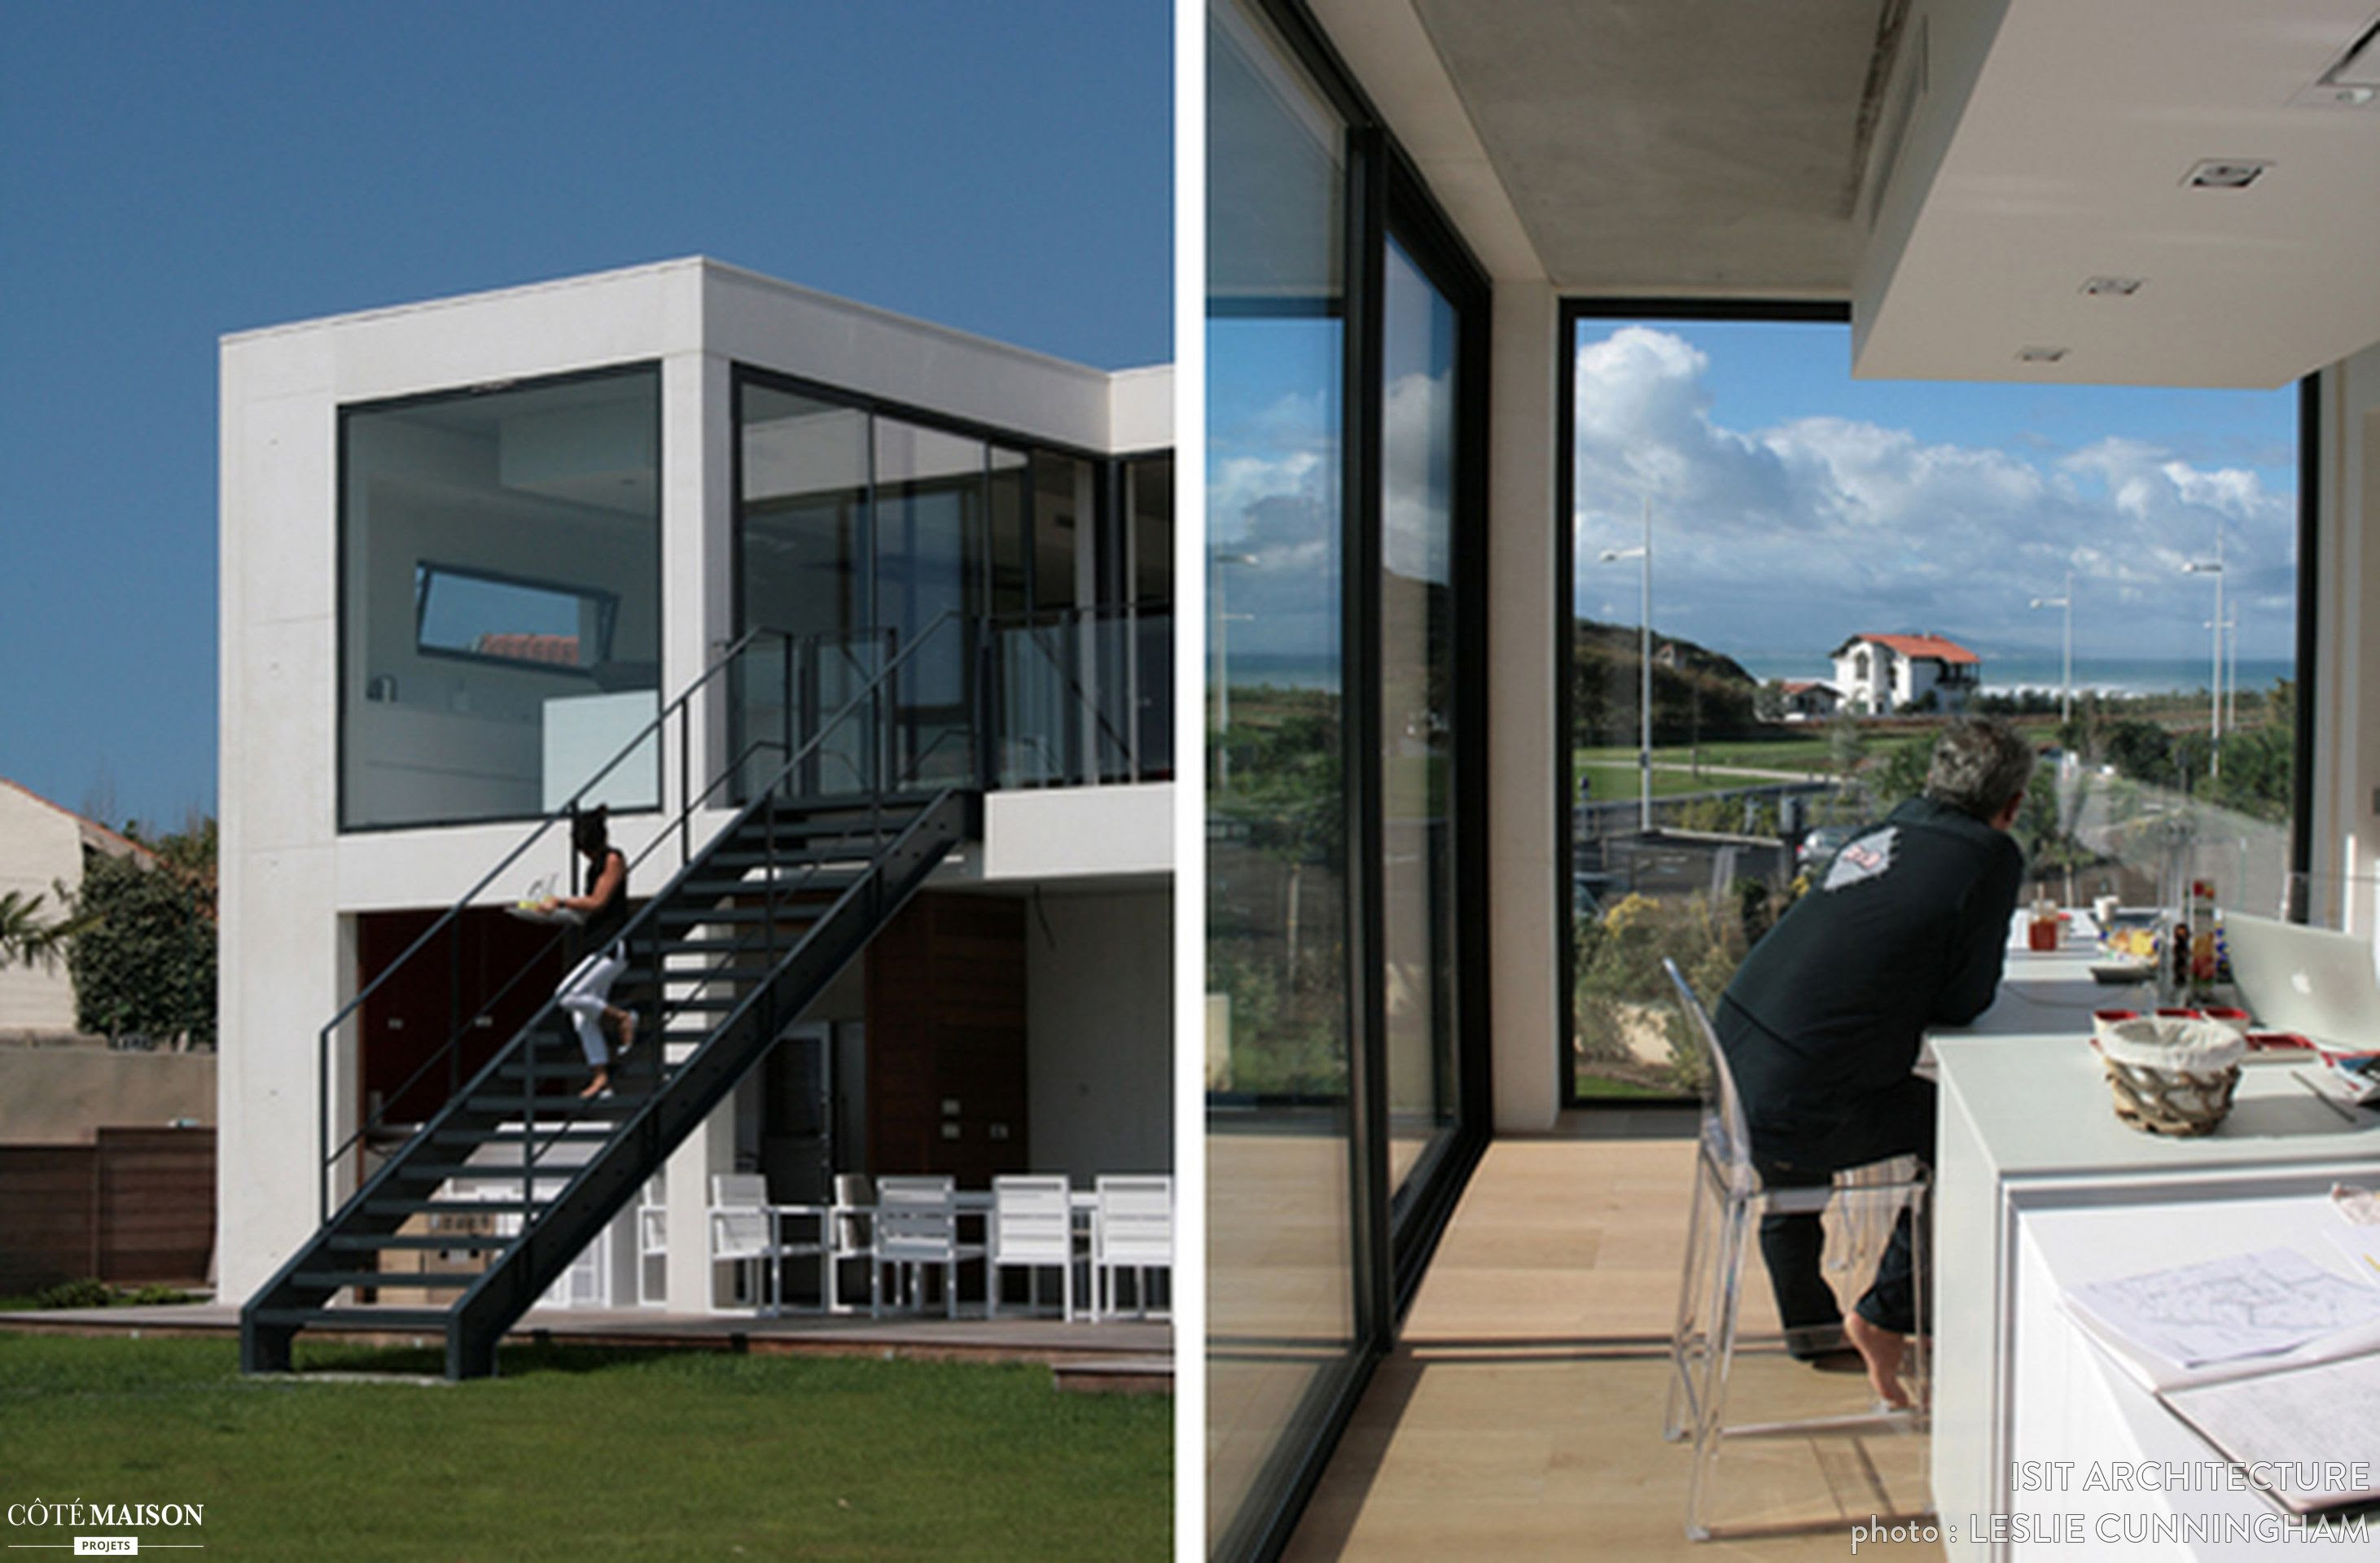 tailacreaciones: Maison Moderne Biarritz